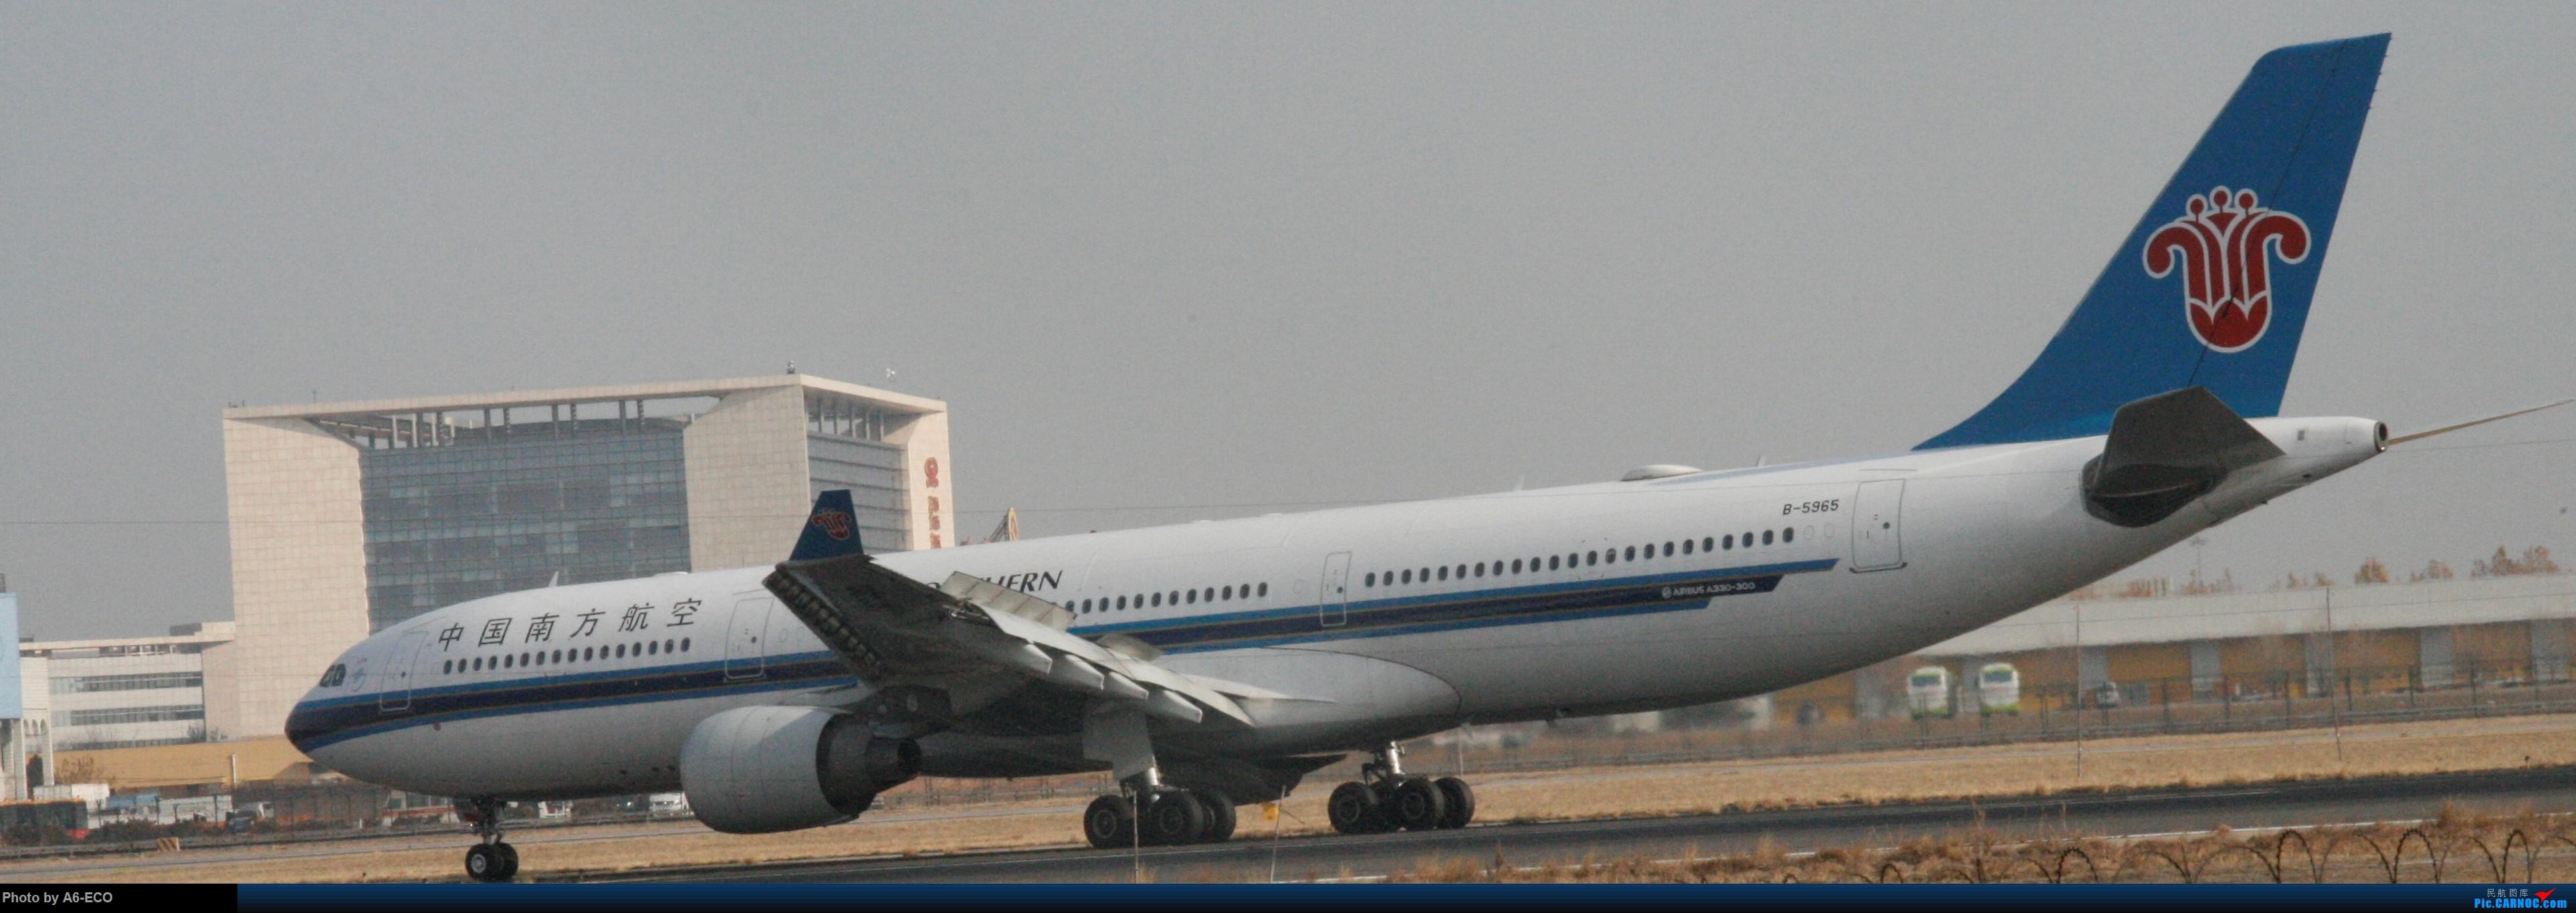 Re:[原创]今天运气极好,云南孔雀,B-1070,2个菜航邮戳,泡菜航彩绘,东航邮戳...... AIRBUS A330-300 B-5965 中国北京首都国际机场